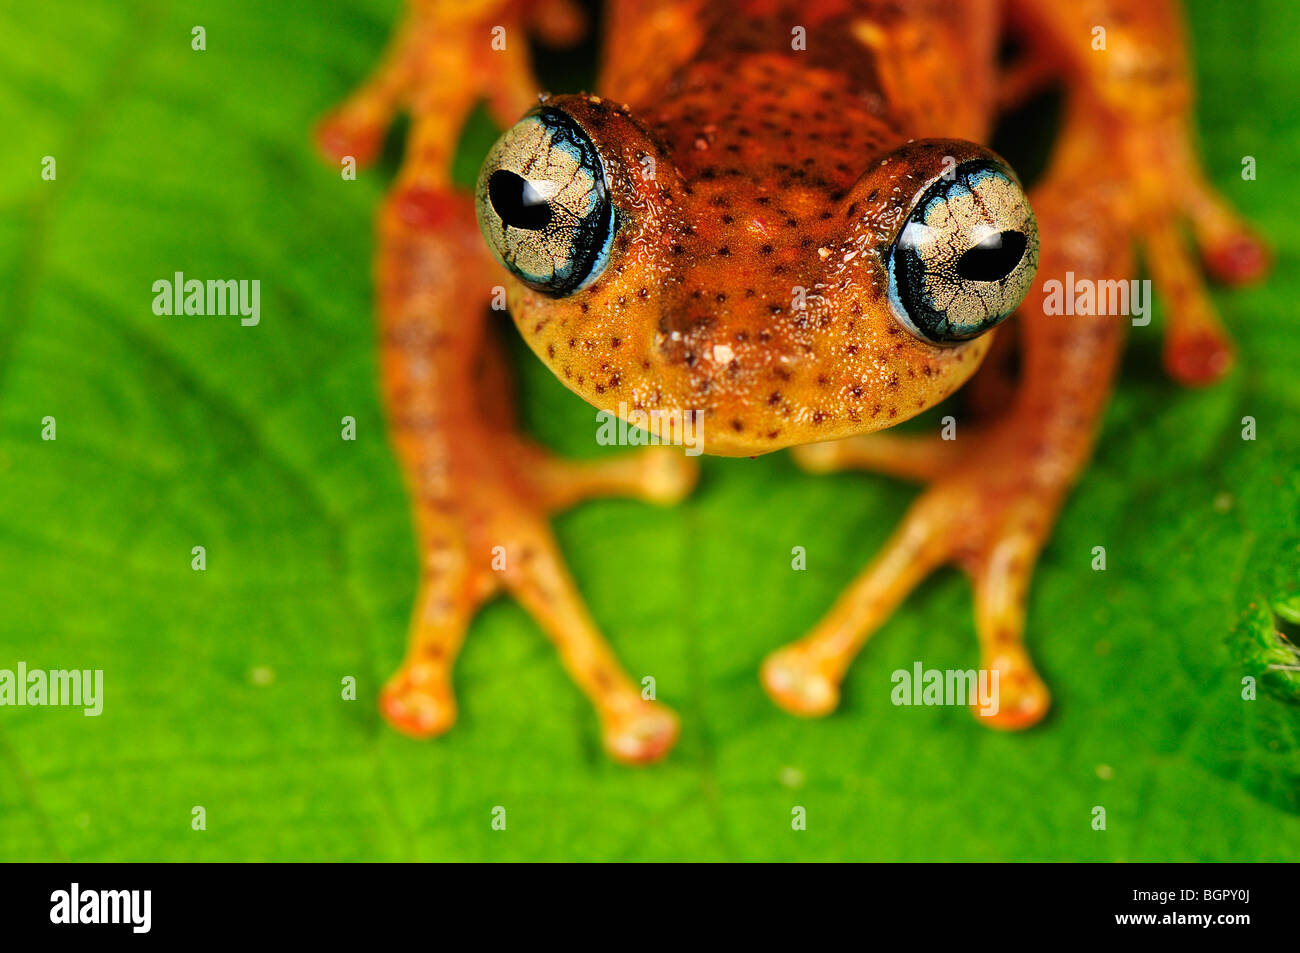 Laubfrosch (Boophis Tephraeomystax) (Boophis Difficilis}, Erwachsener, Andasibe-Mantadia Nationalpark, Madagaskar Stockbild